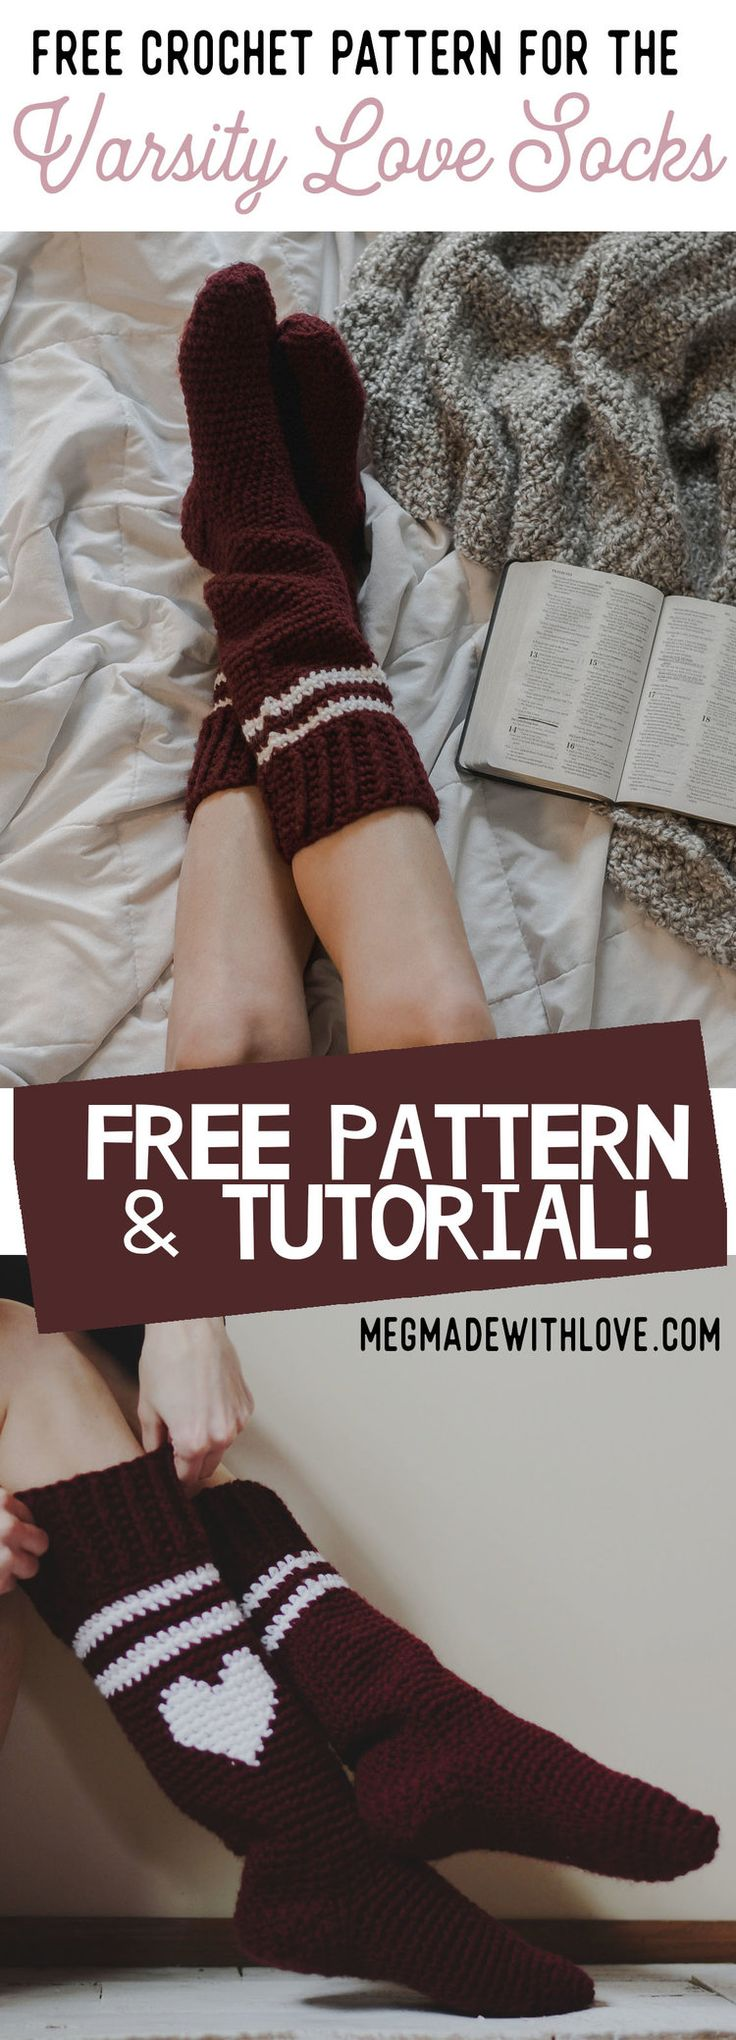 Free Crochet Pattern for the Varsity Love Socks — Megmade with Love - Crochet Socks Pattern